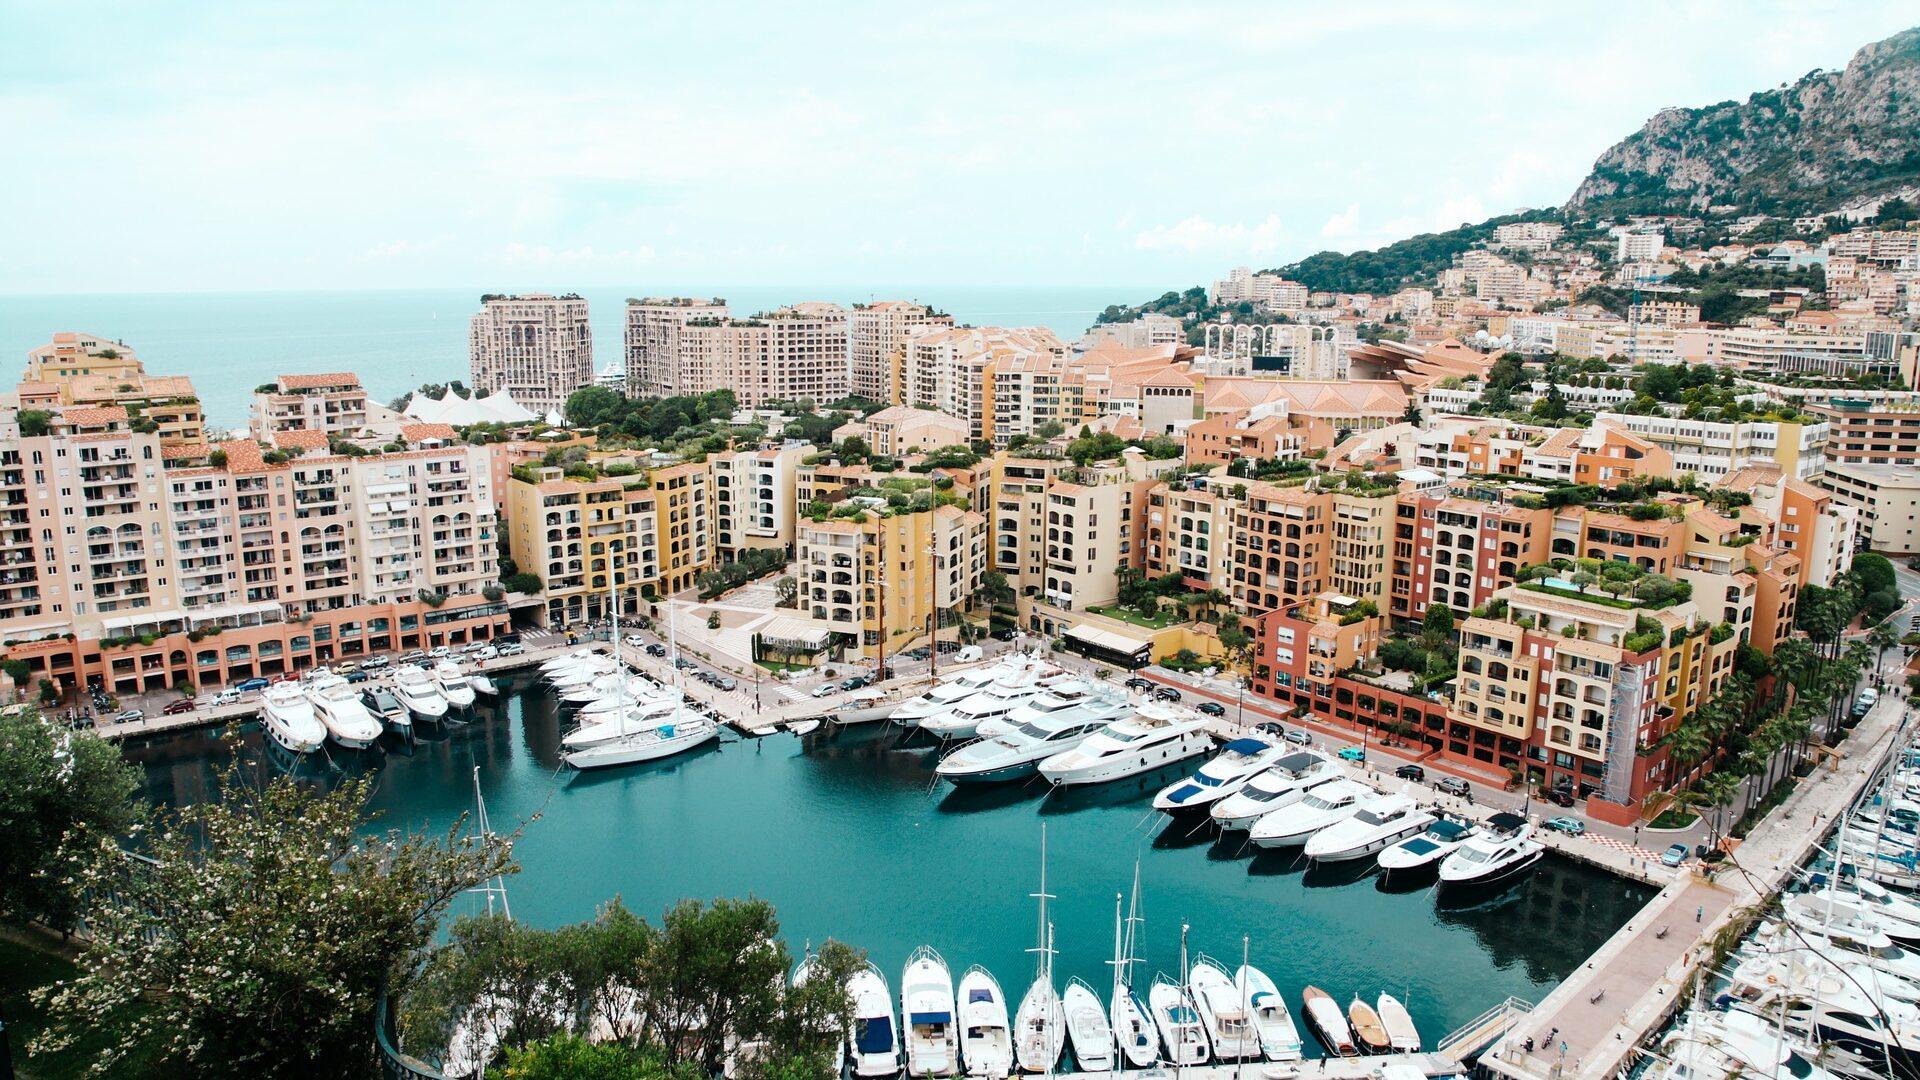 Yacht harbor in Monte Carlo